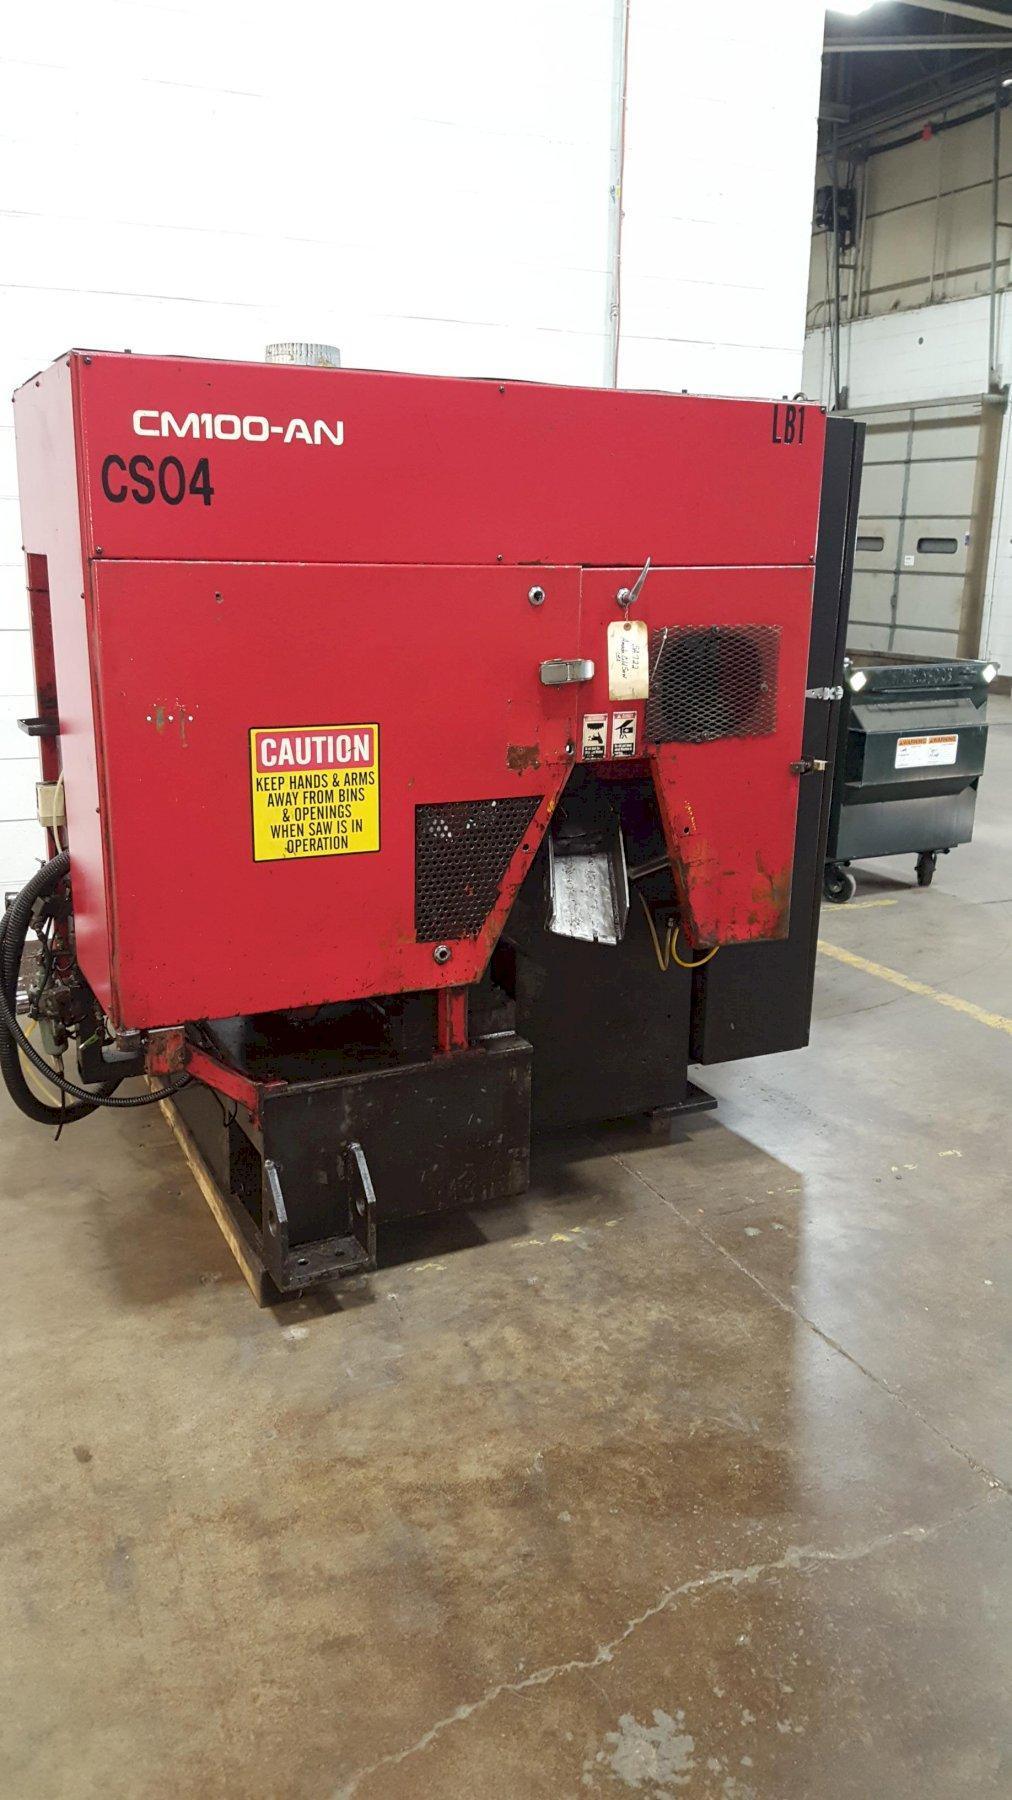 Amada Model CM100AN Carbide Circular Blade Saw System